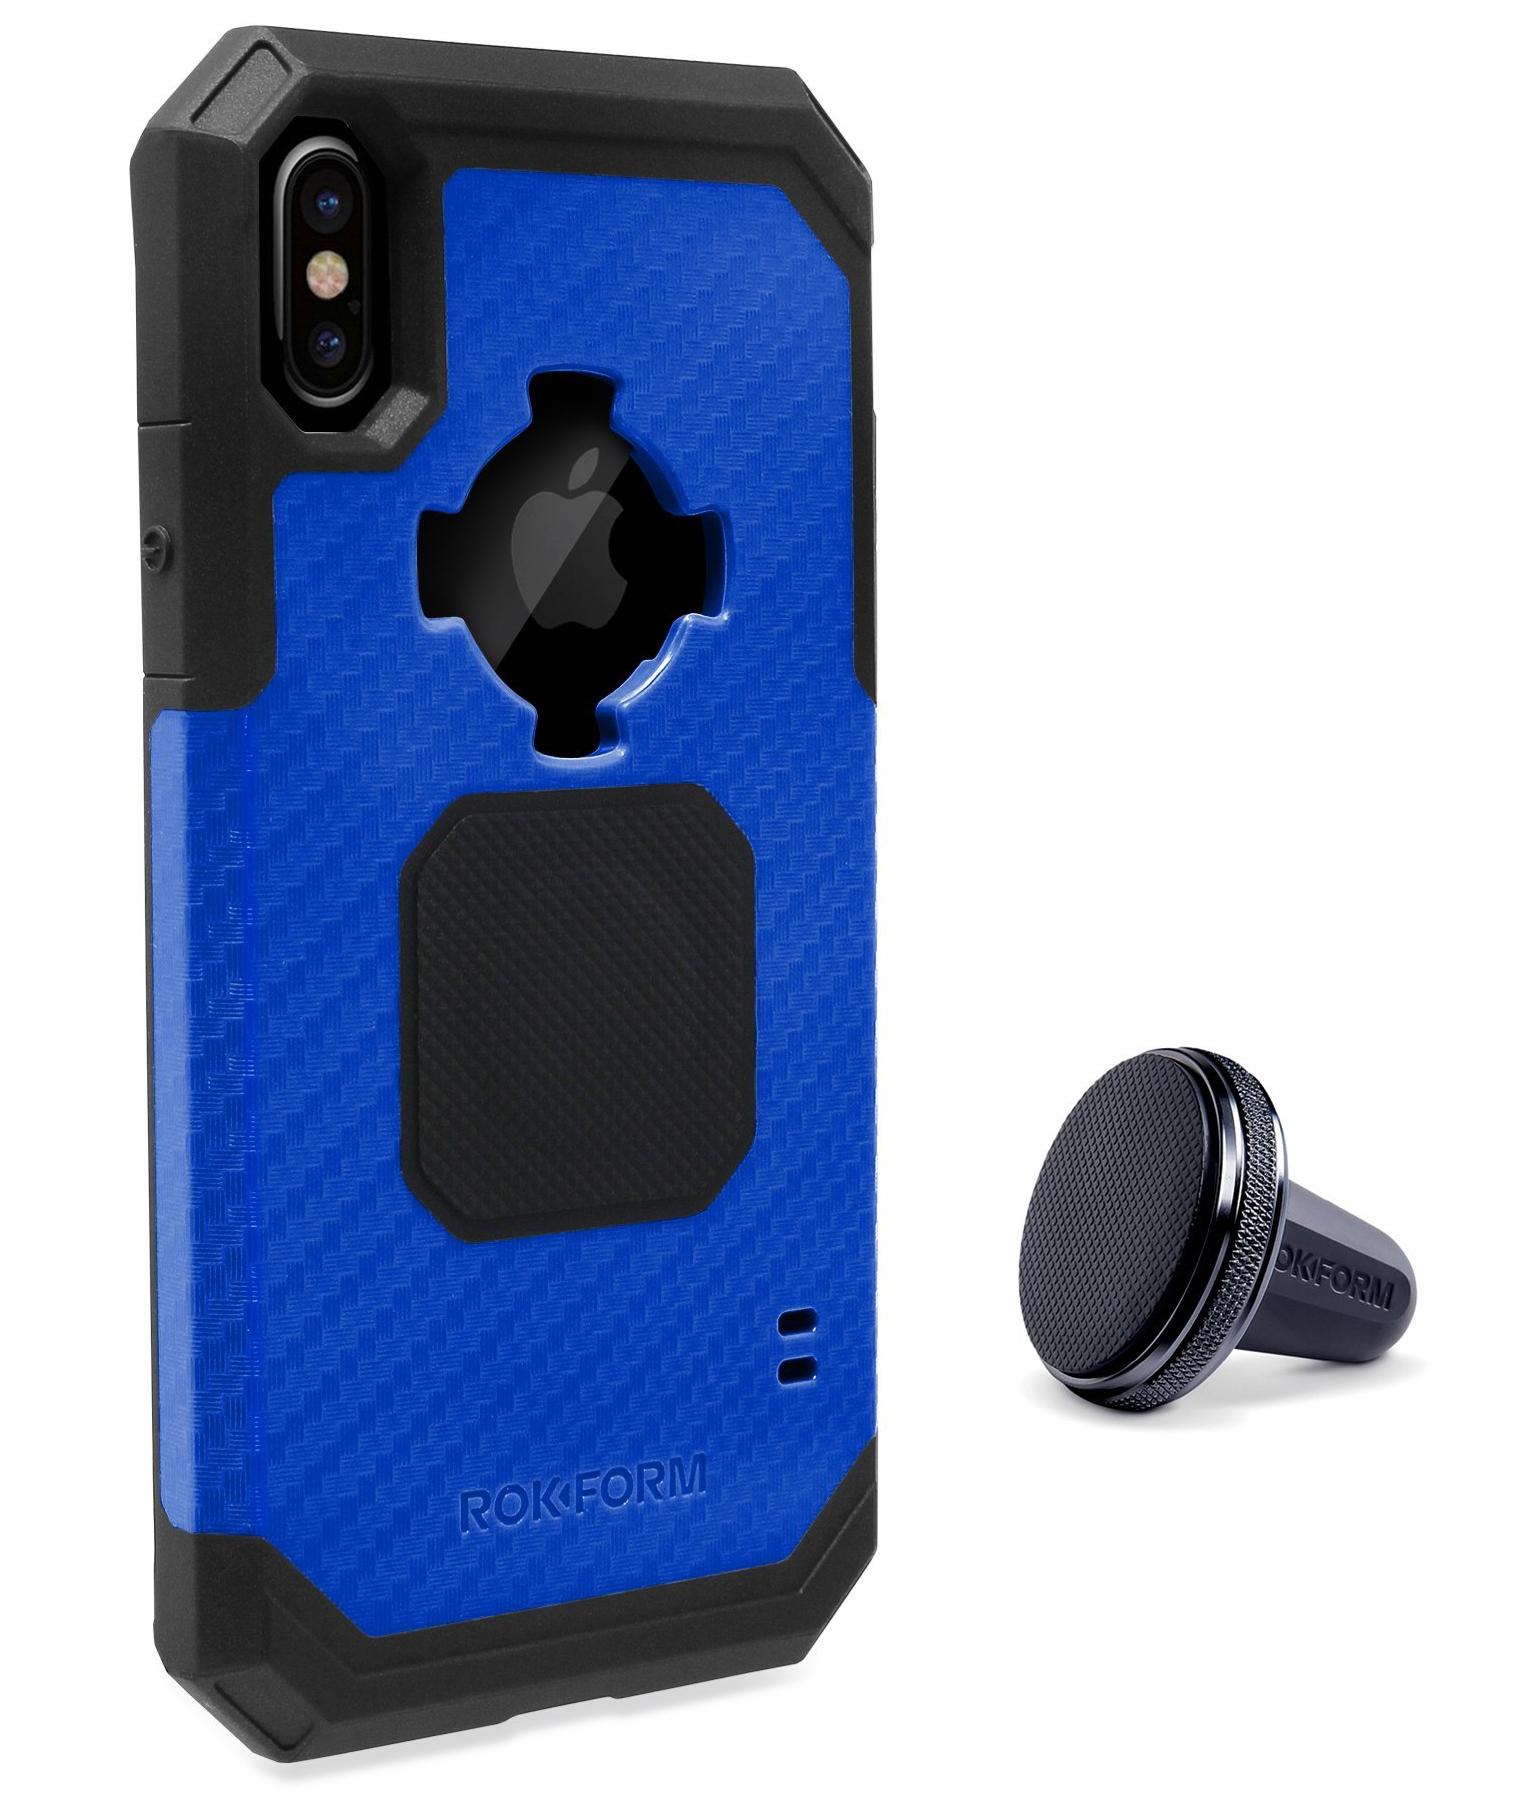 Rokform Iphone X Rugged Case